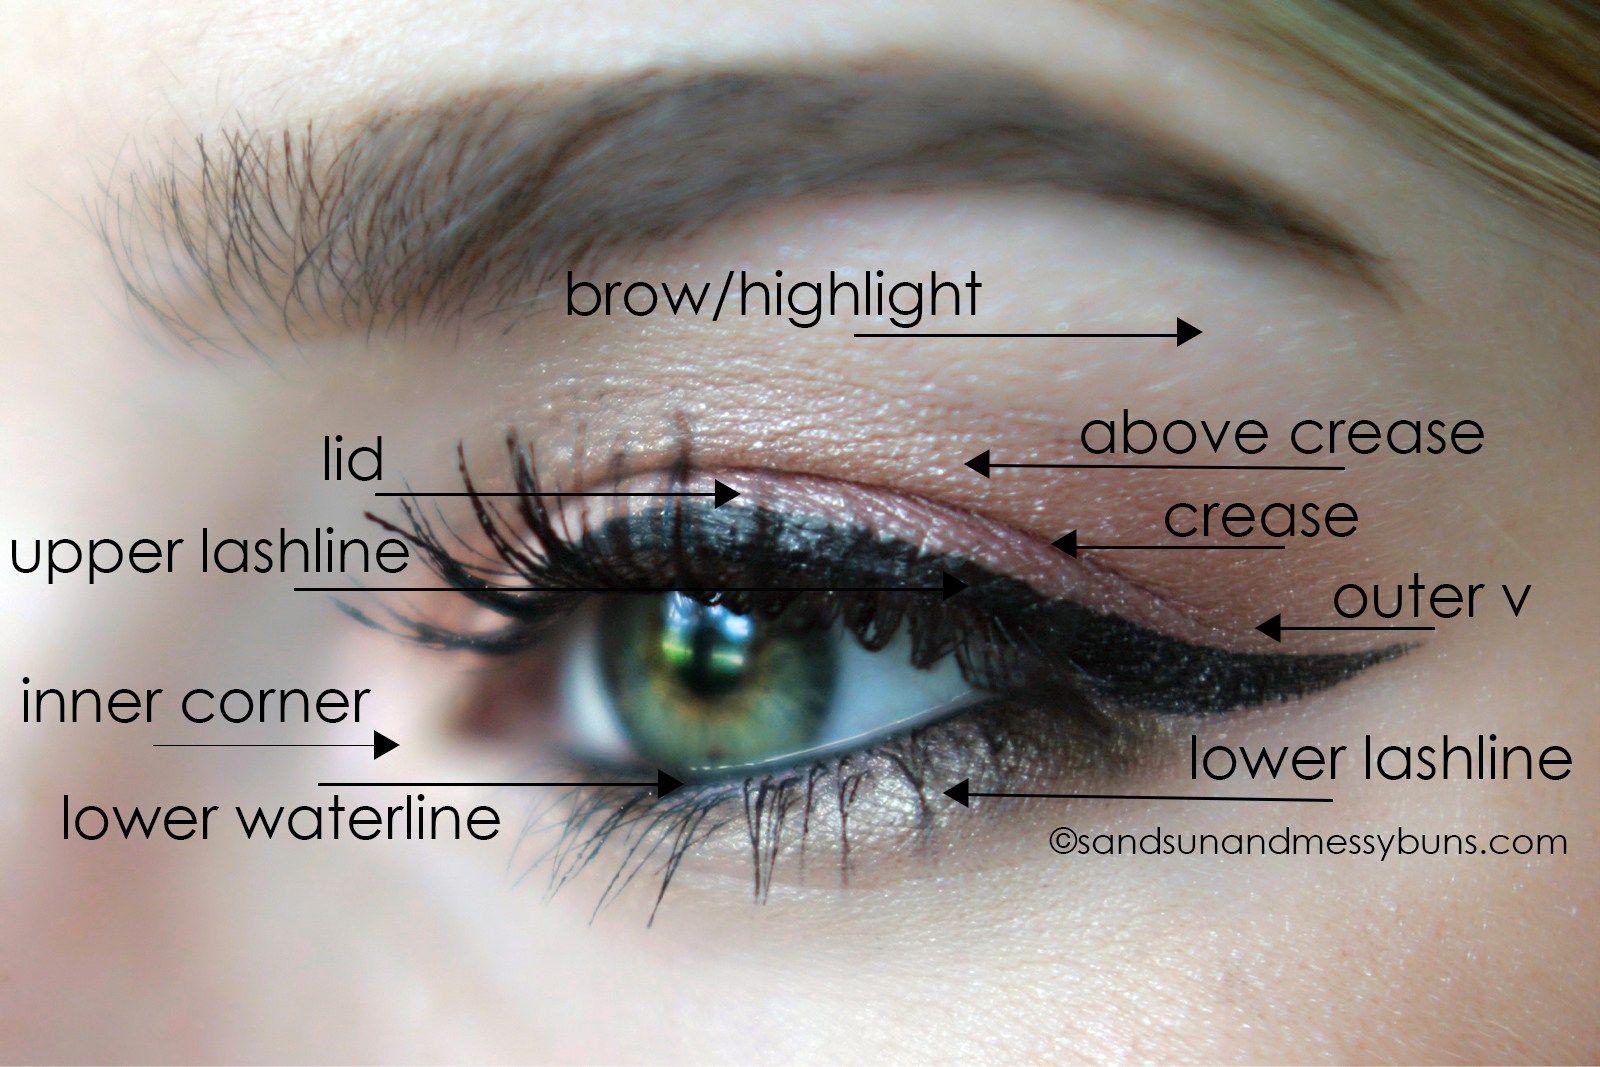 Makeup 101 Eyeshadow Diagram For Makeup Newbies Sand Sun Messy Buns Best Makeup Tutorials Pretty Eye Makeup How To Apply Eyeshadow